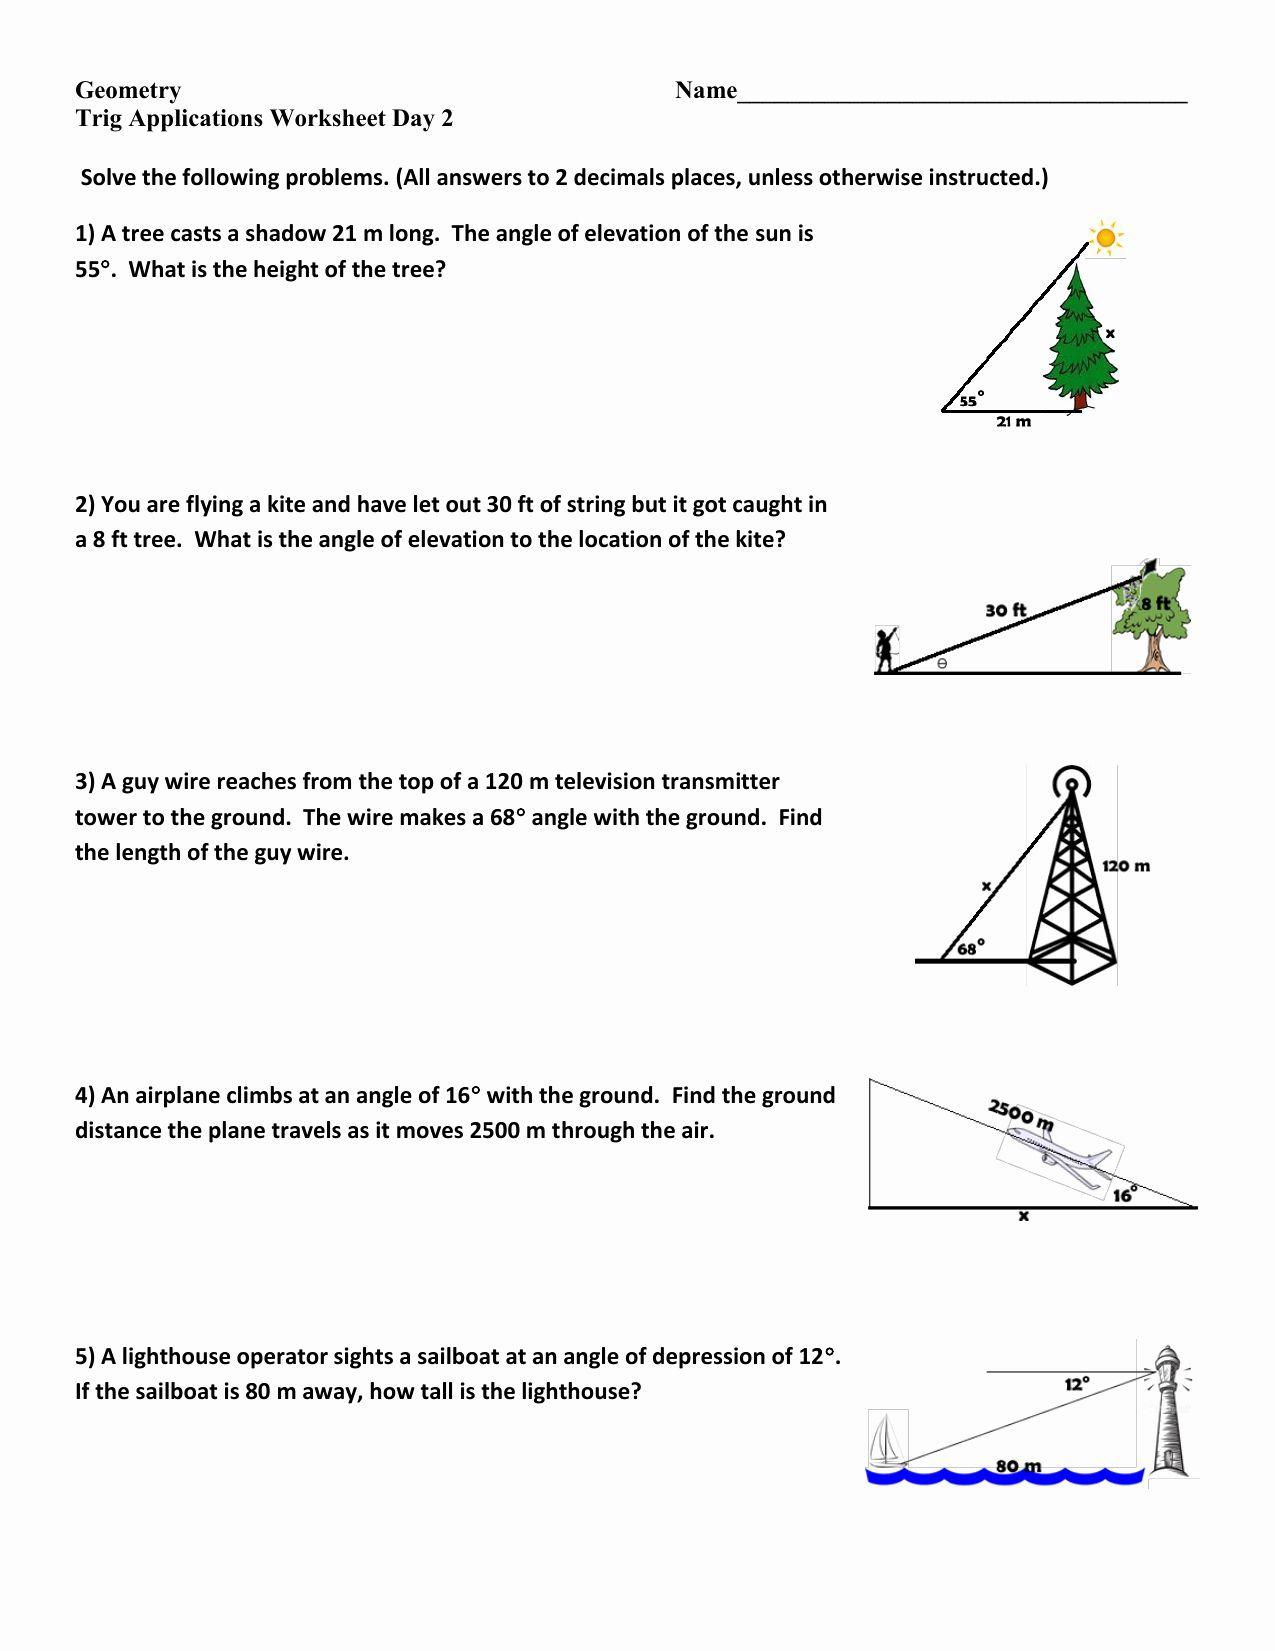 Right Triangle Trigonometry Worksheet Luxury Trigonometry Word Problems  Worksheets with Answers   Trigonometry worksheets [ 1651 x 1275 Pixel ]